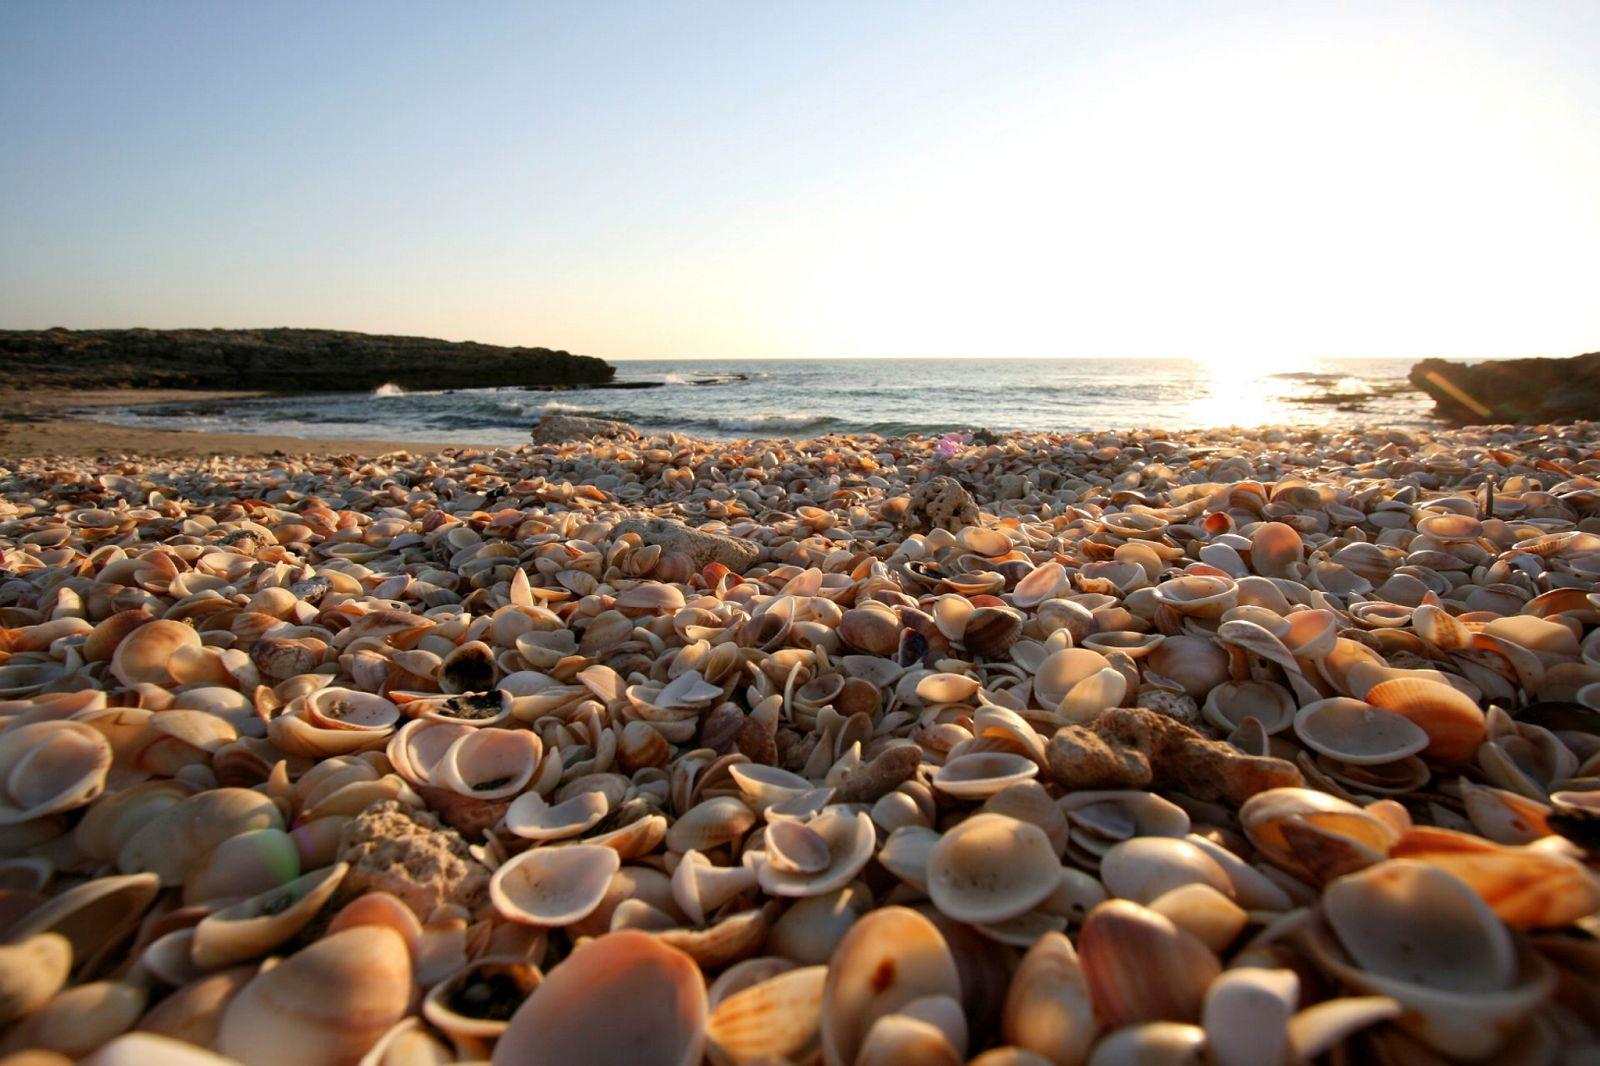 f90_habonim_beach.jpg